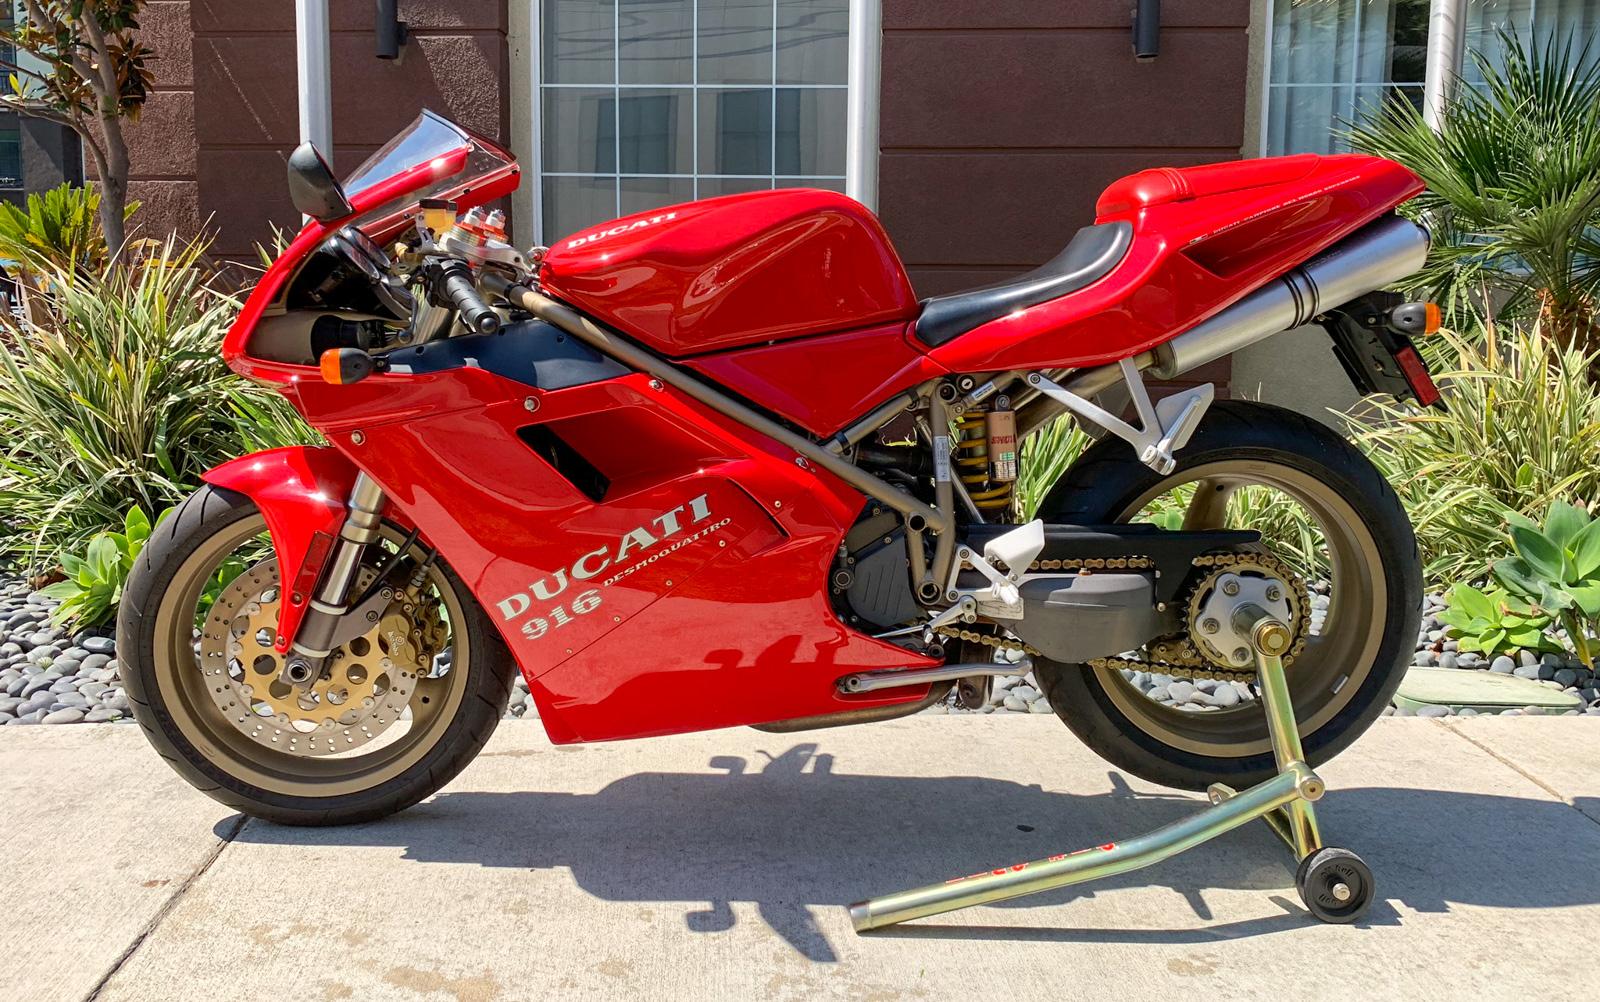 New Auction Bike – 1997 Ducati 916